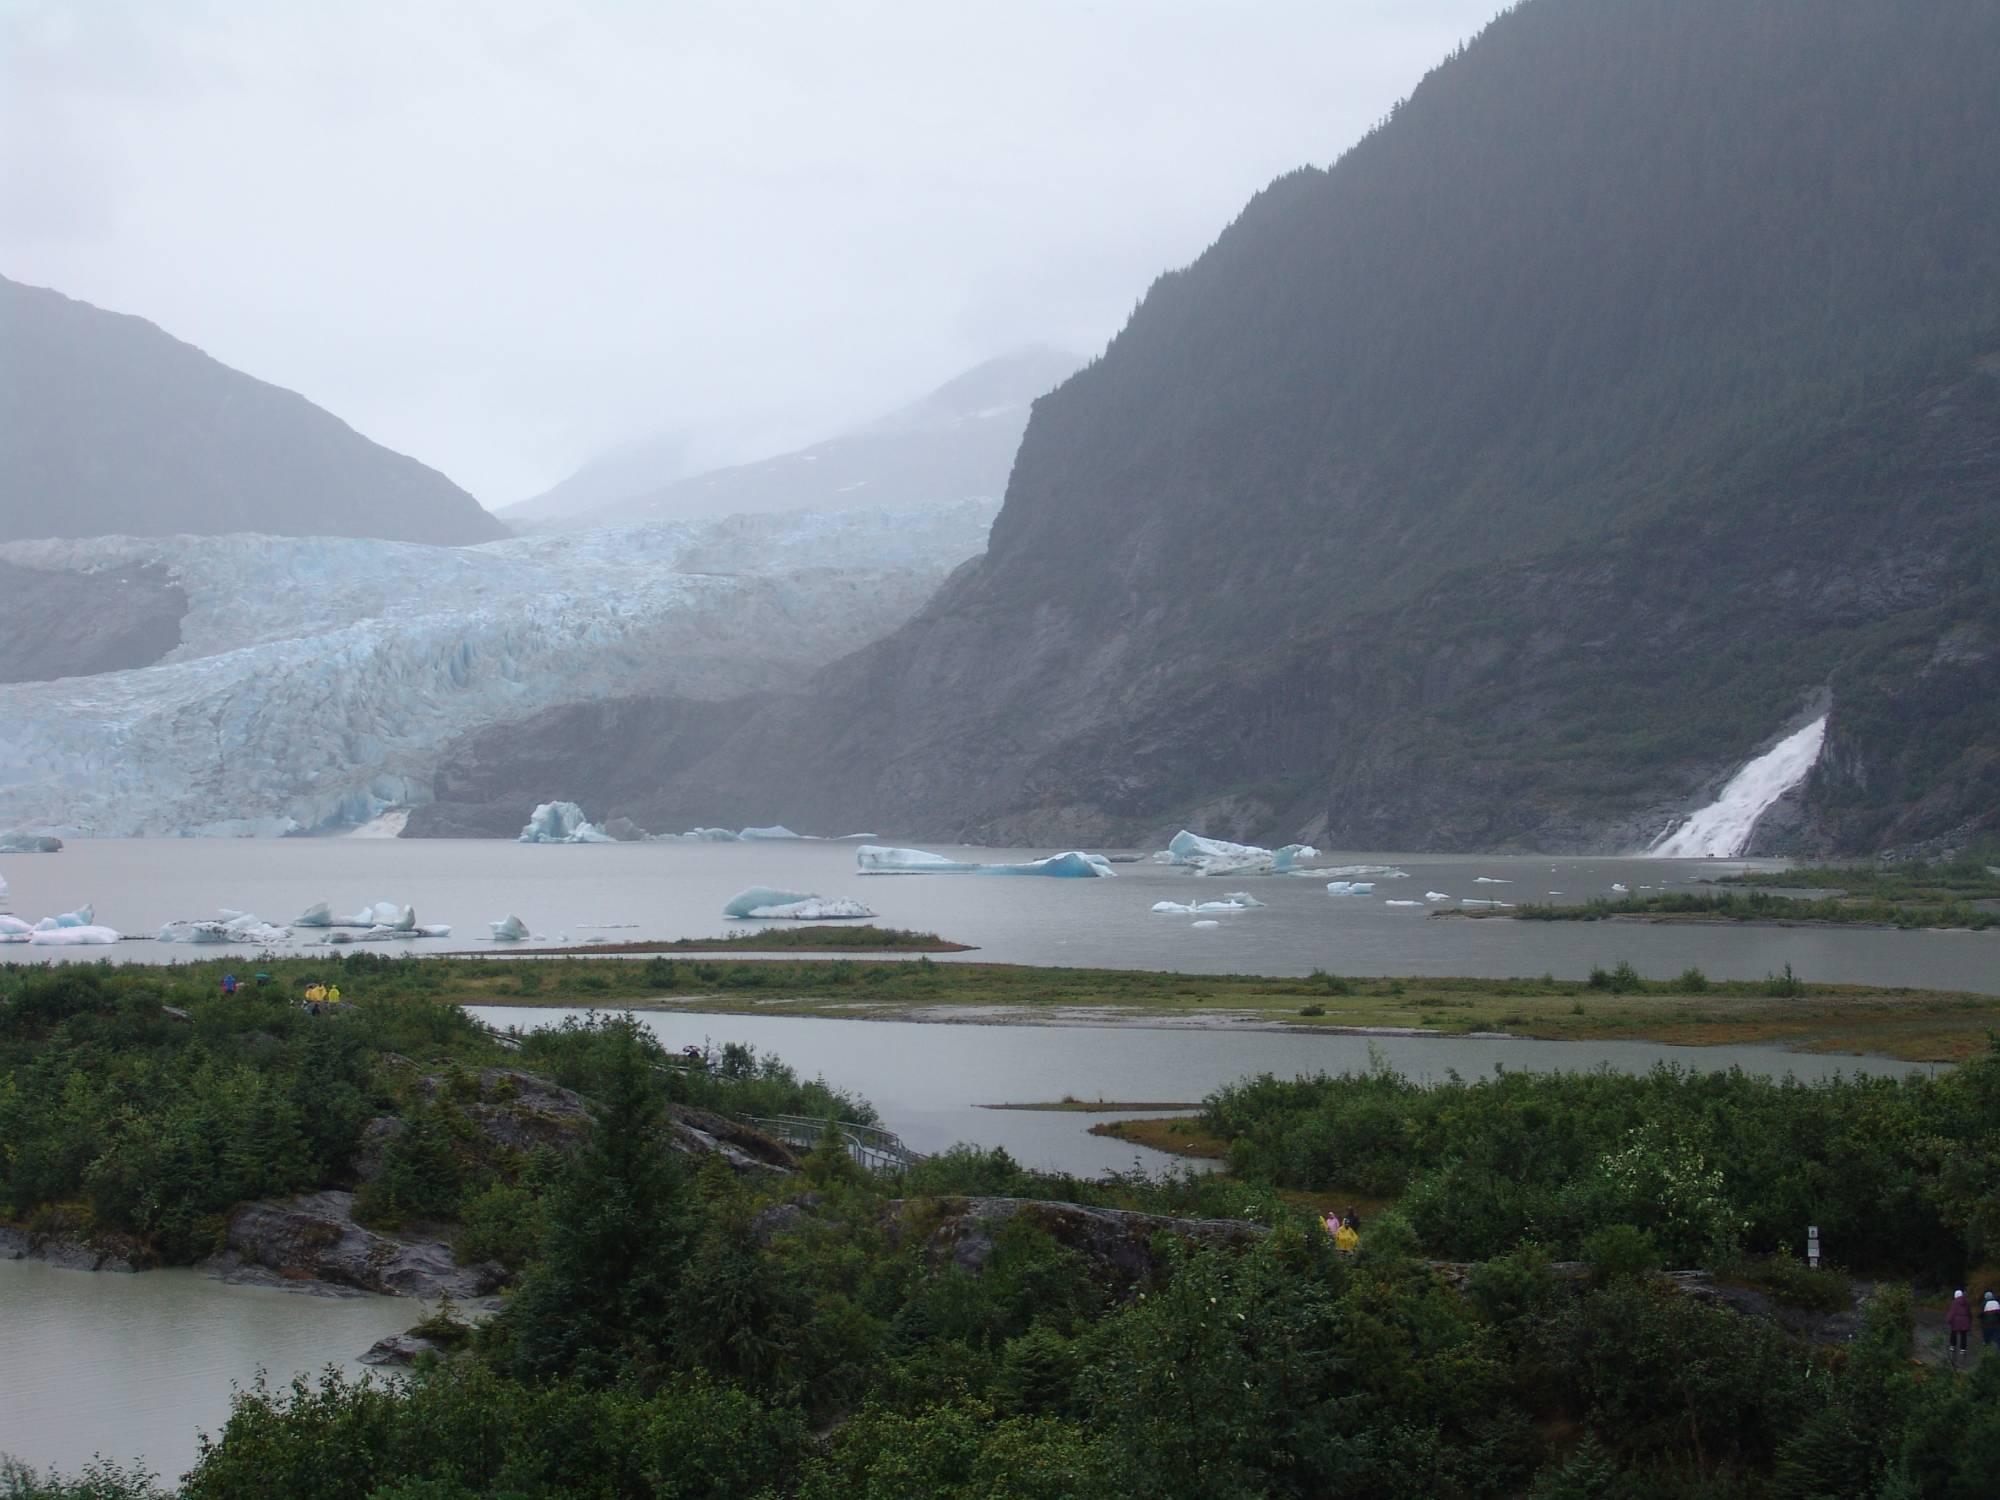 Alaskan cruise - Mendenhall Glacier photo